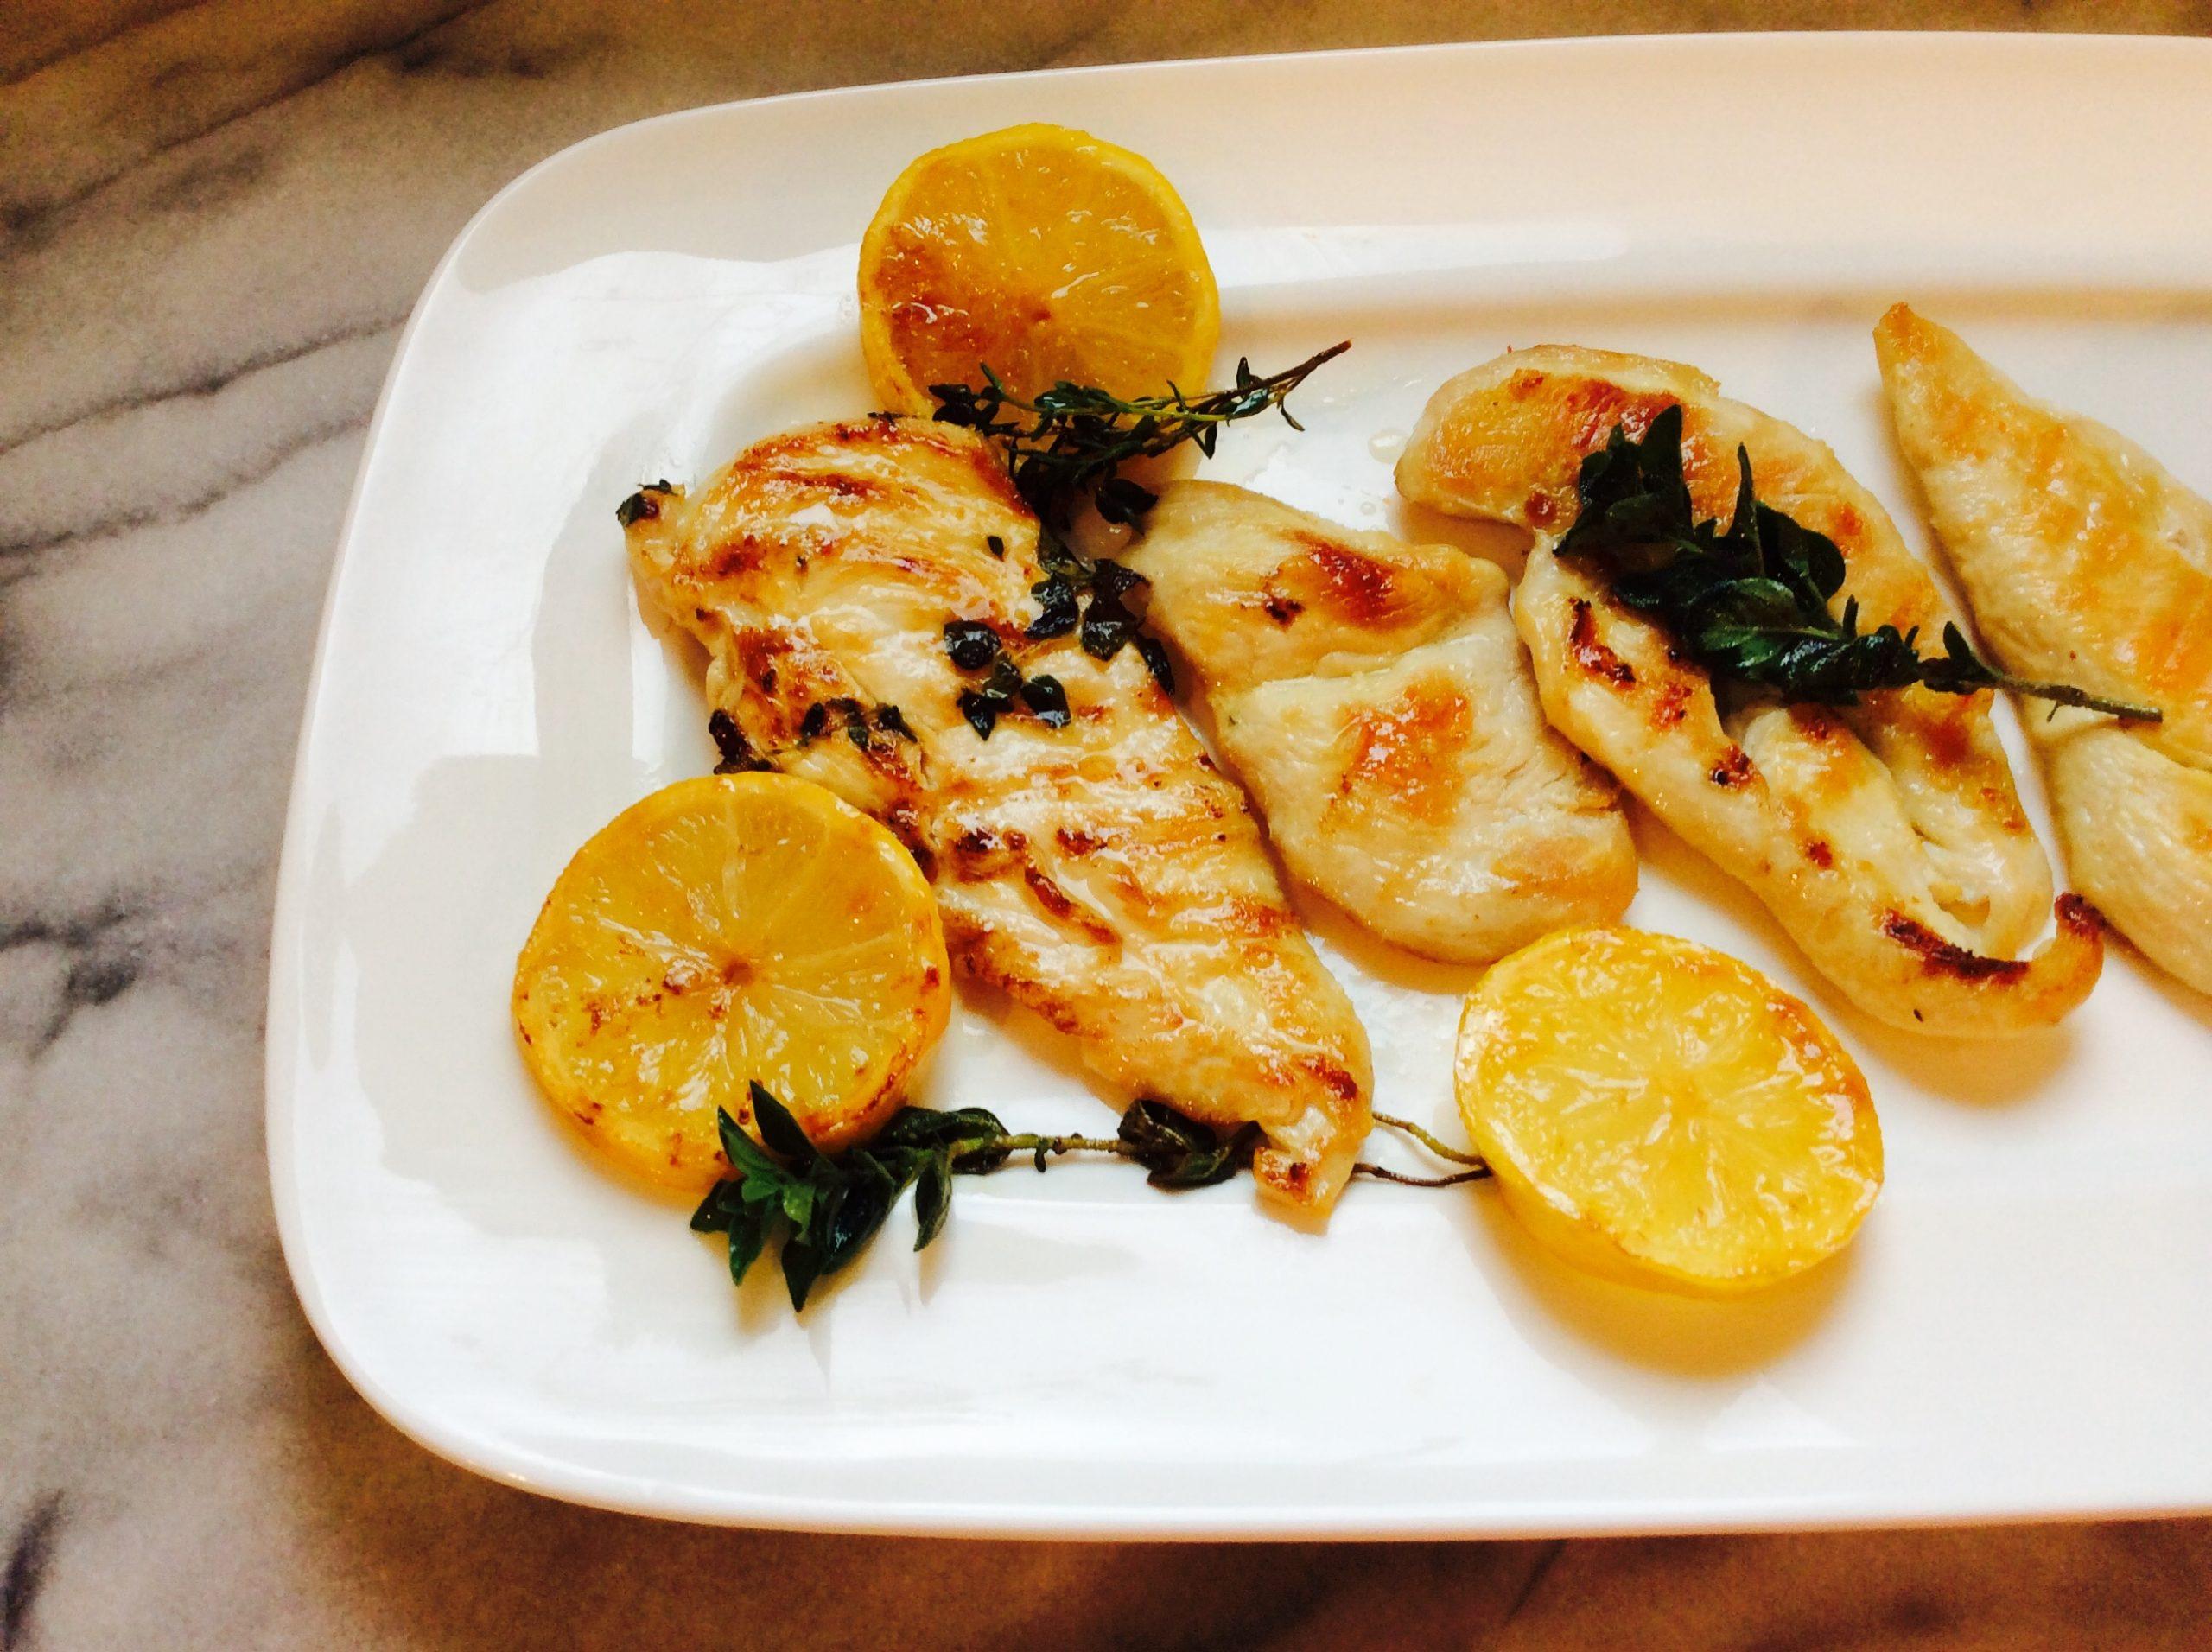 #recettepoulet #recette #recettesante #recettepouletcitron #pouletcitron #recipe #recipechiken #lemonchiken